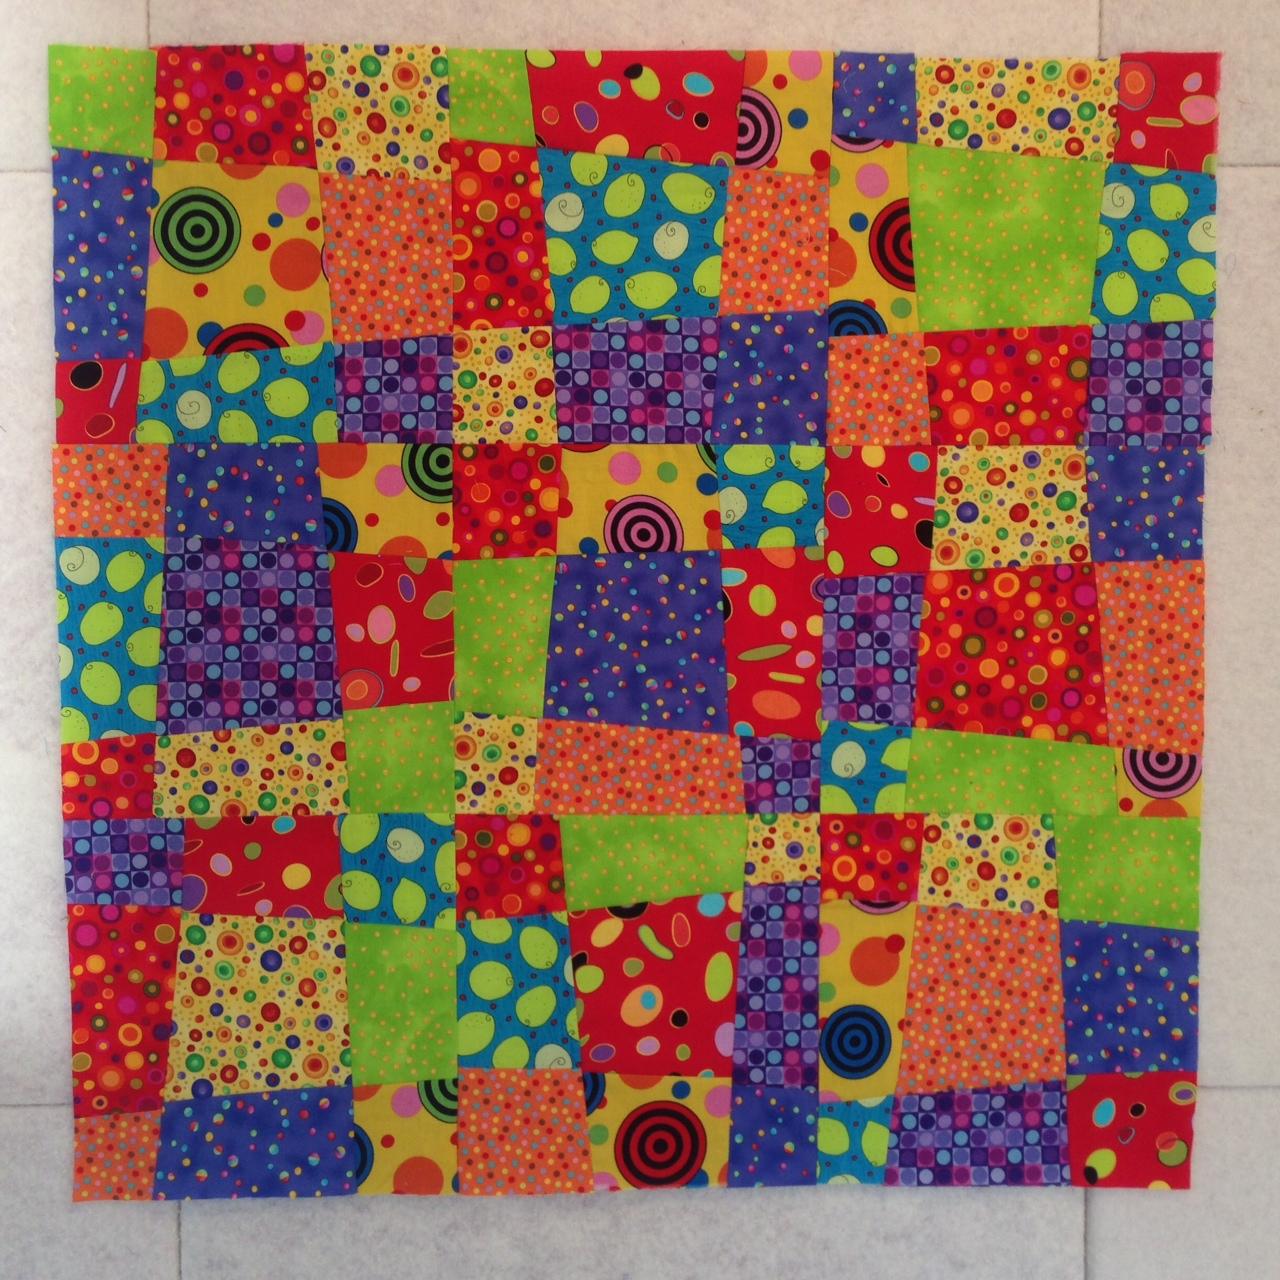 Arranging the Crazy Nine Patch Blocks